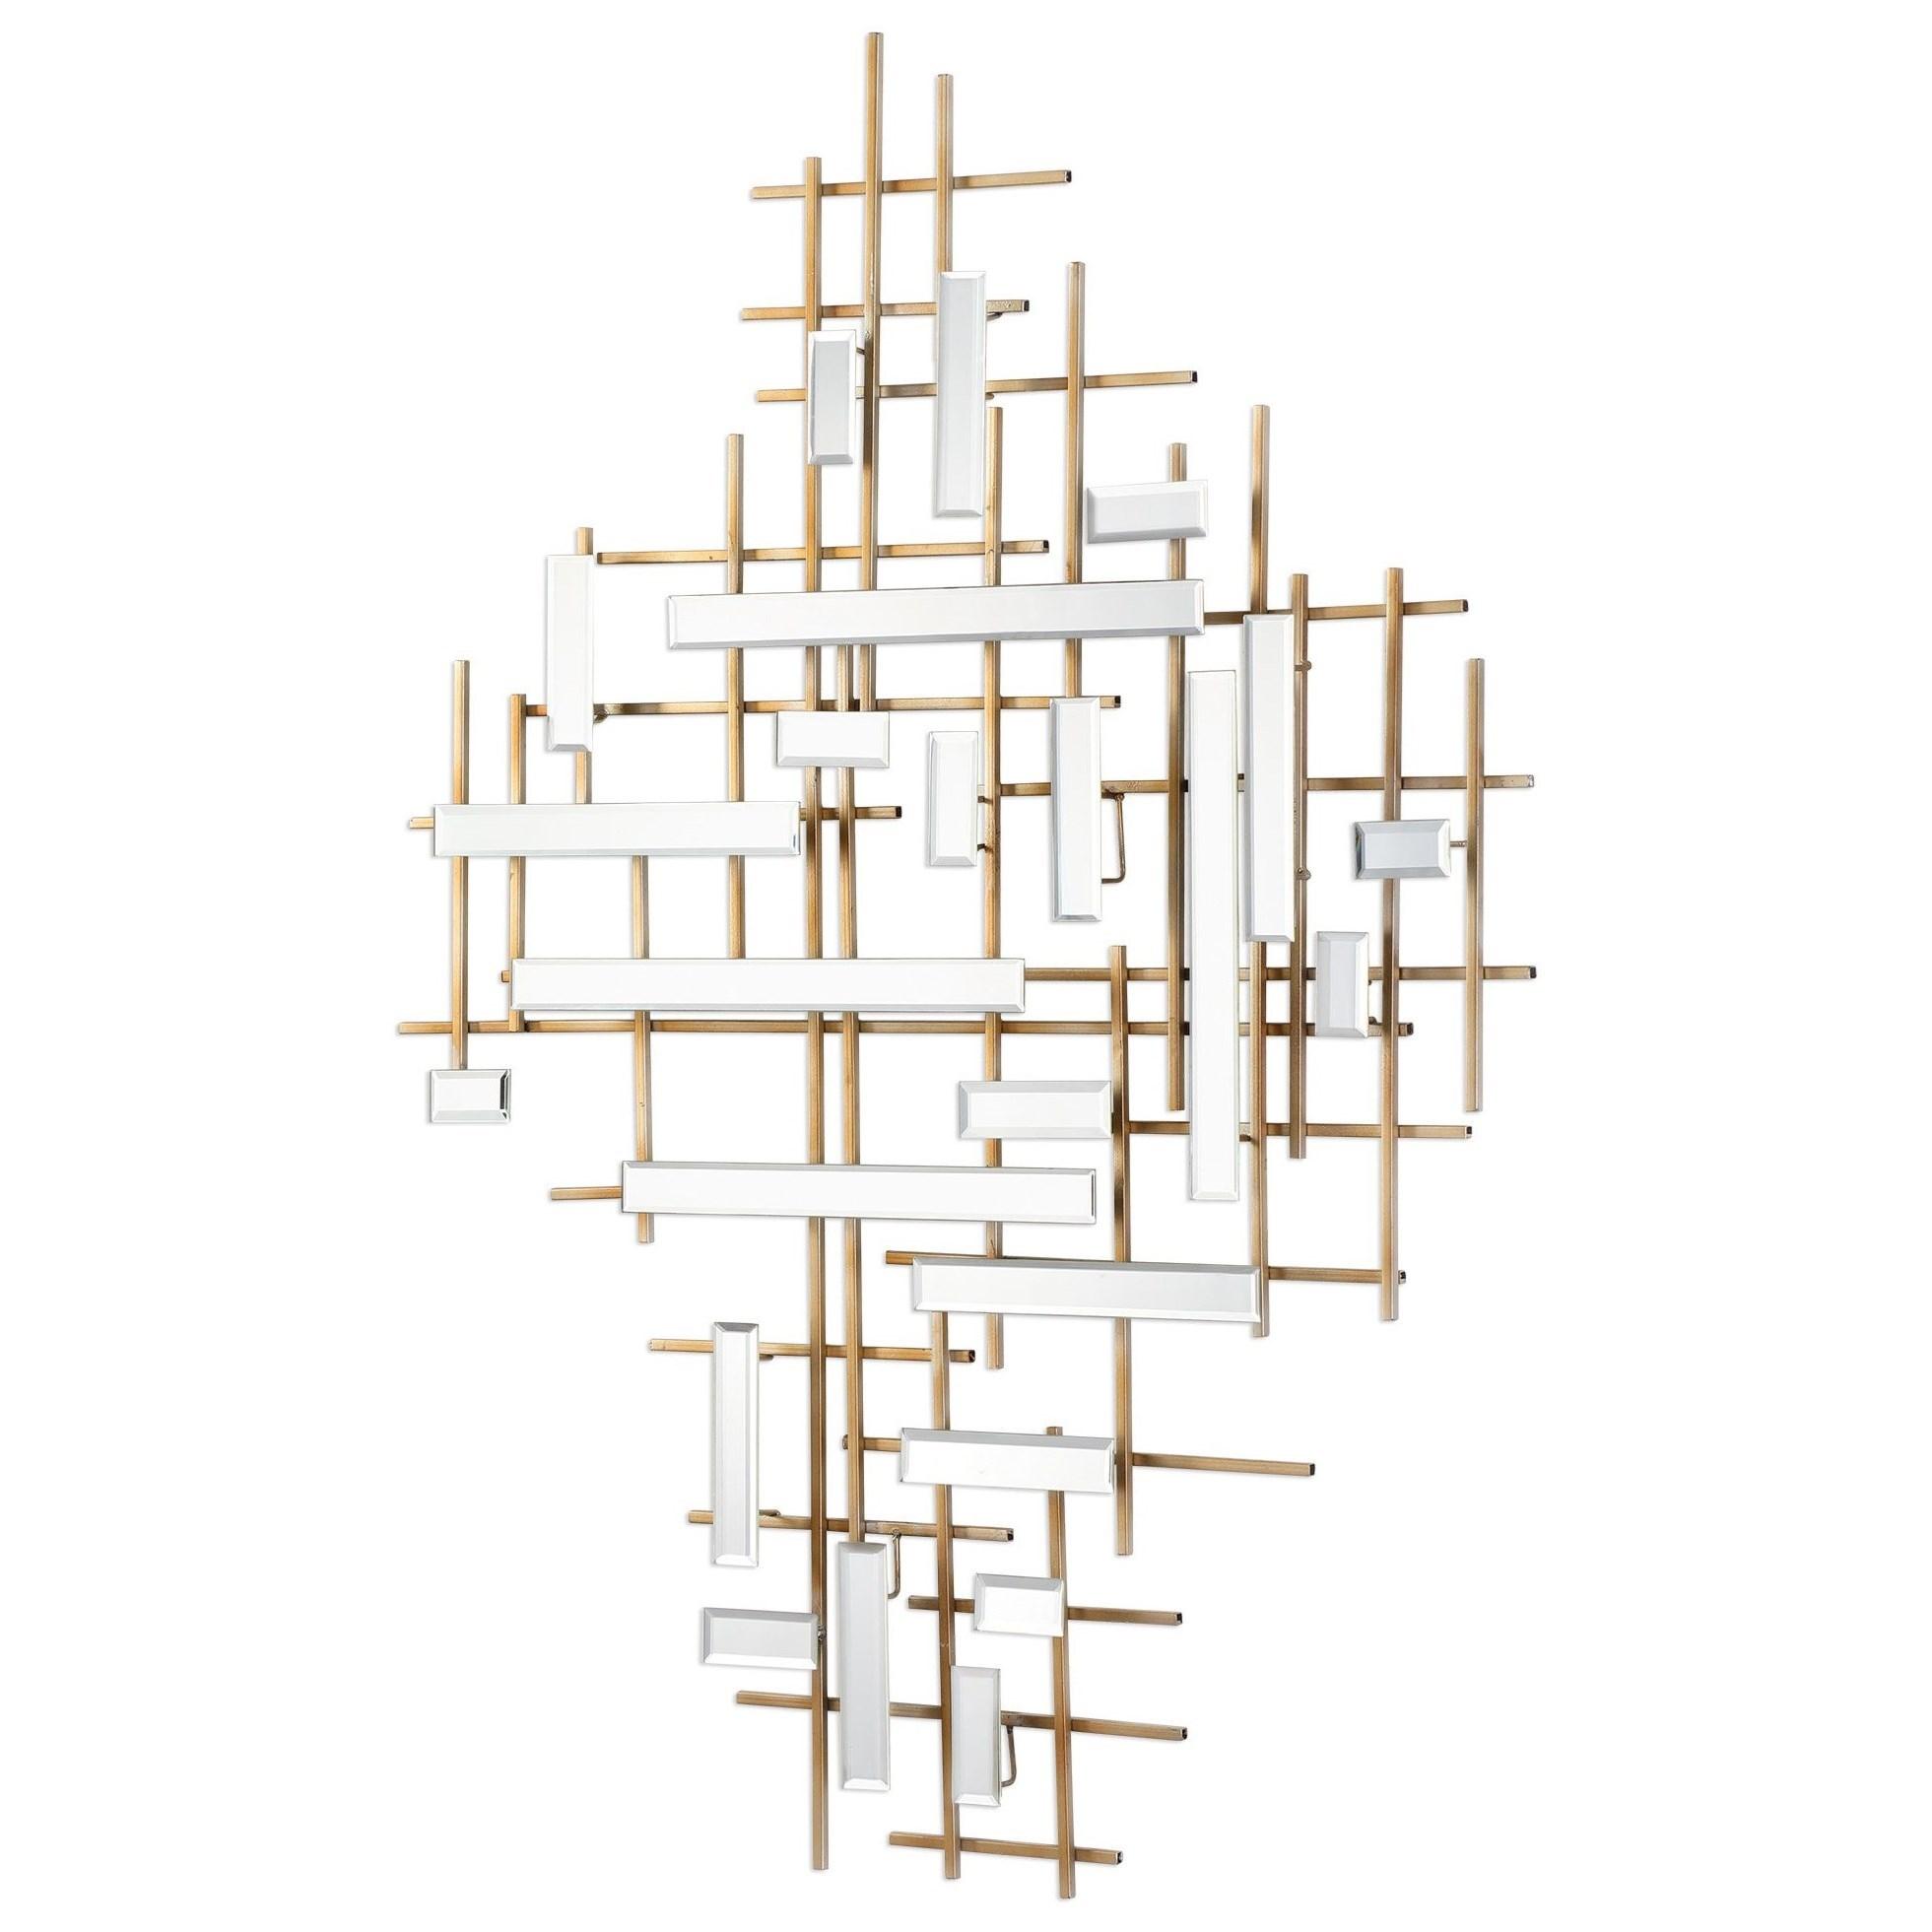 Apollo Gold & Mirrored Wall Art